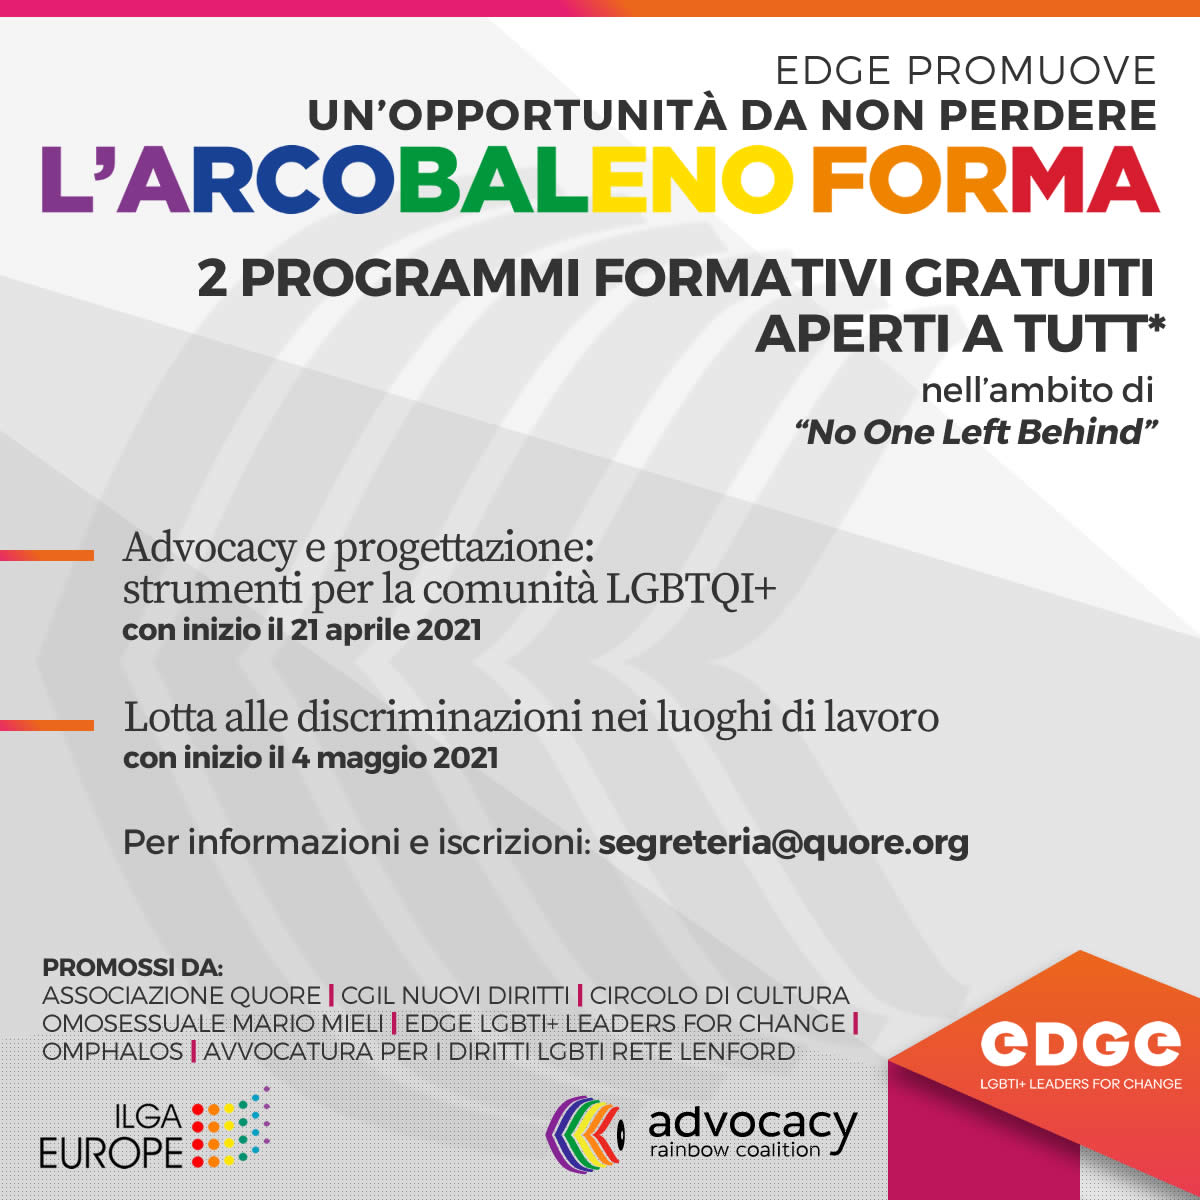 l'Arcobaleno forma | EDGE LGBTI+Leaders for change